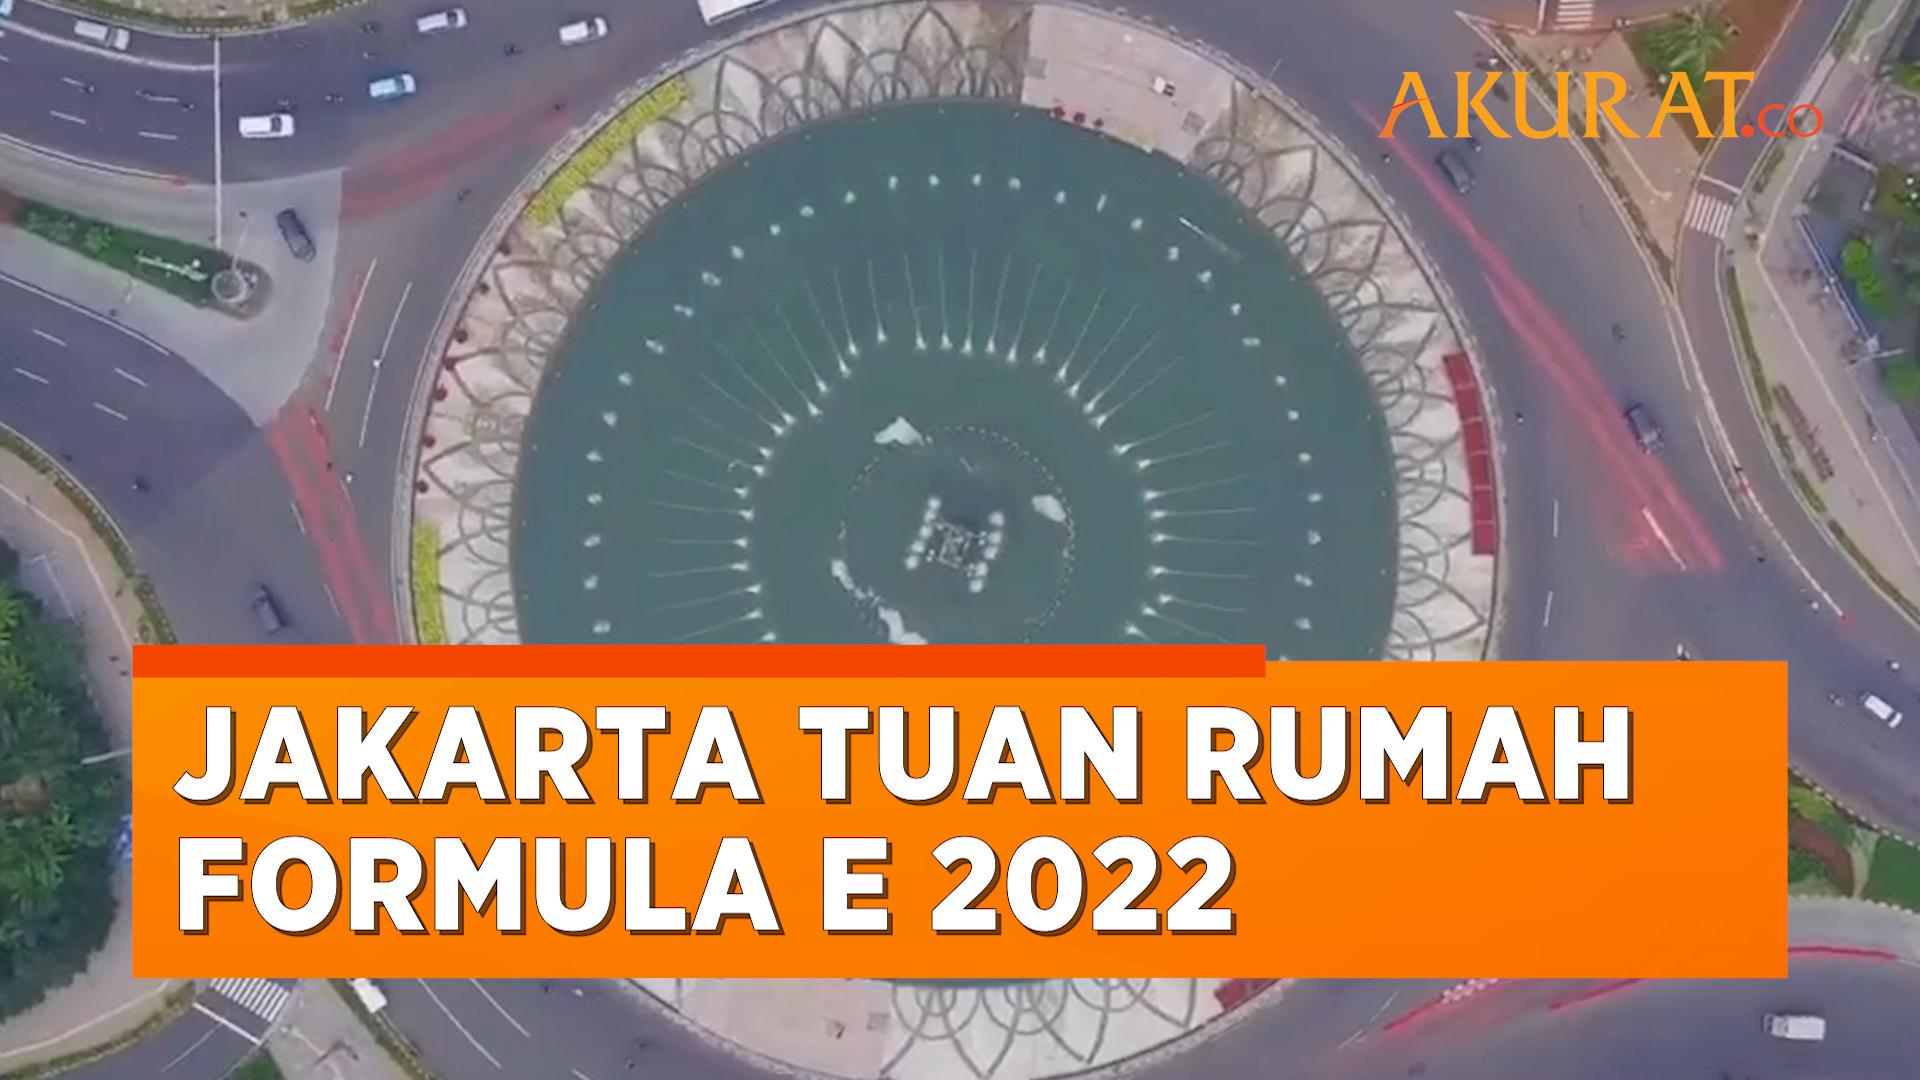 DKI Jakarta Resmi Jadi Tuan Rumah Formula E 2022